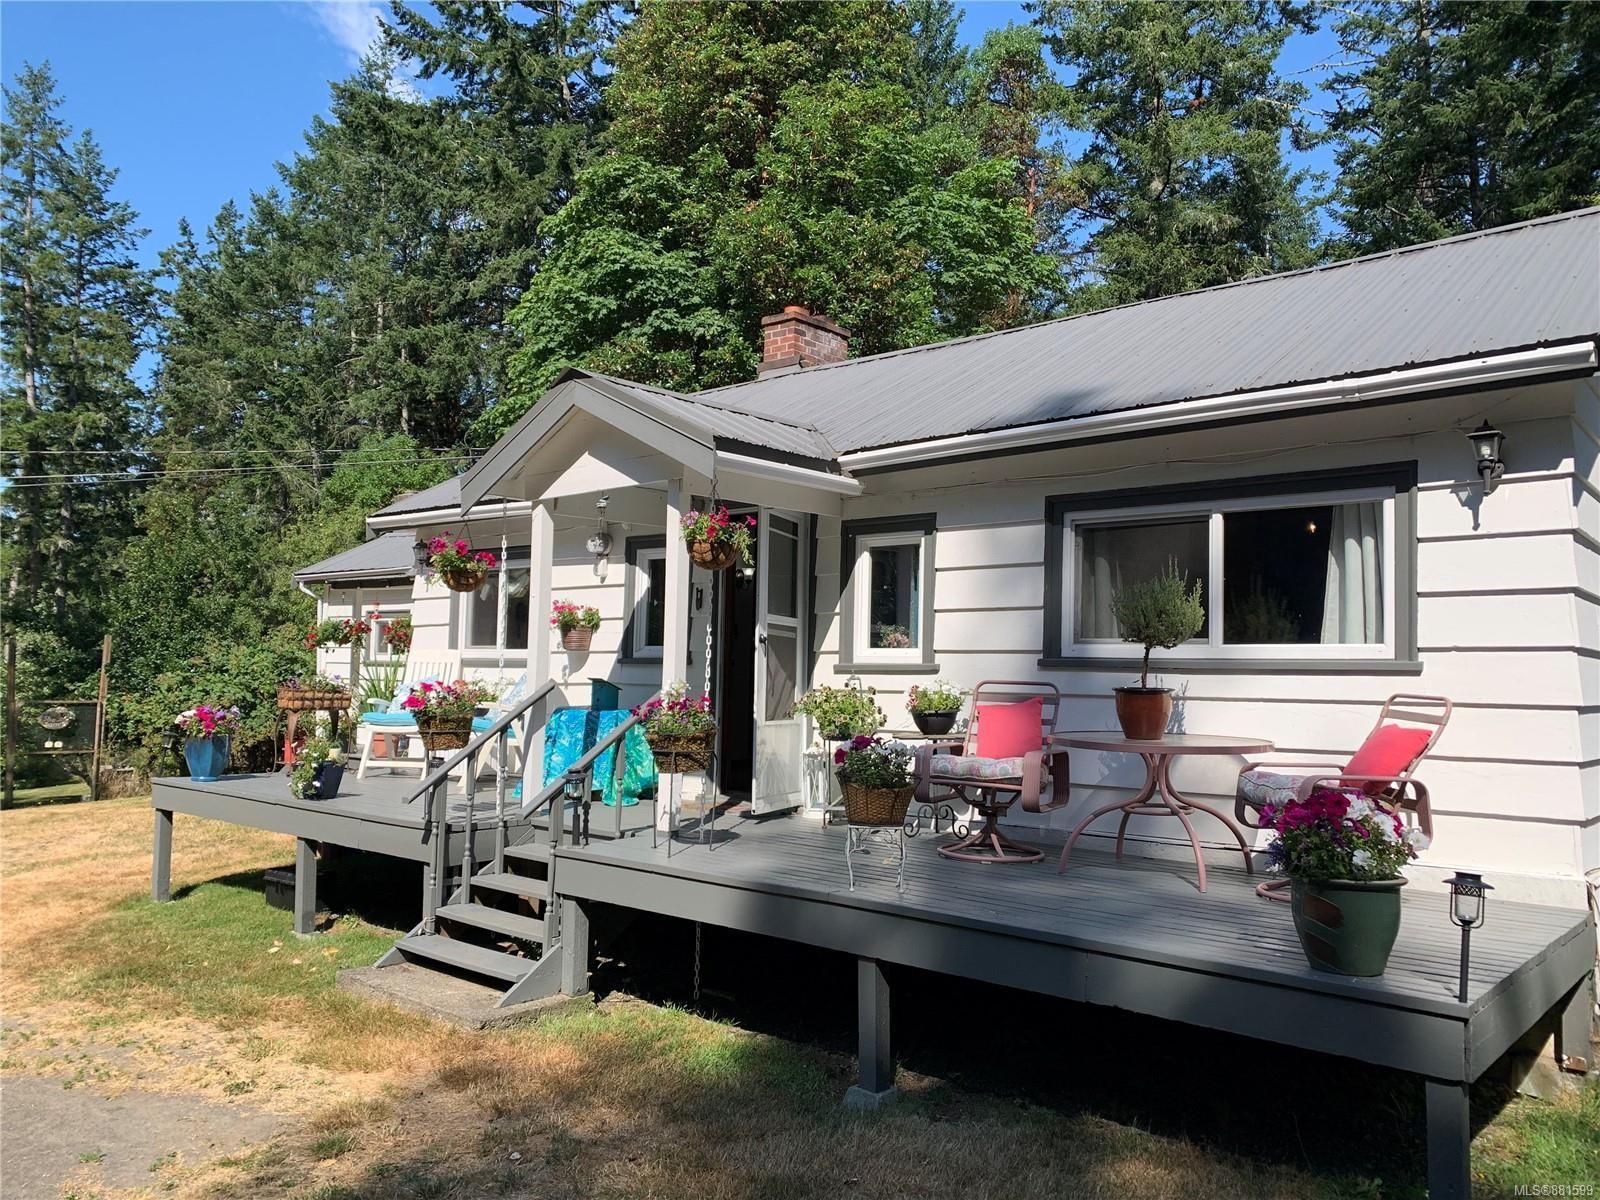 Main Photo: 1451 Beaver Point Rd in : GI Salt Spring House for sale (Gulf Islands)  : MLS®# 881599